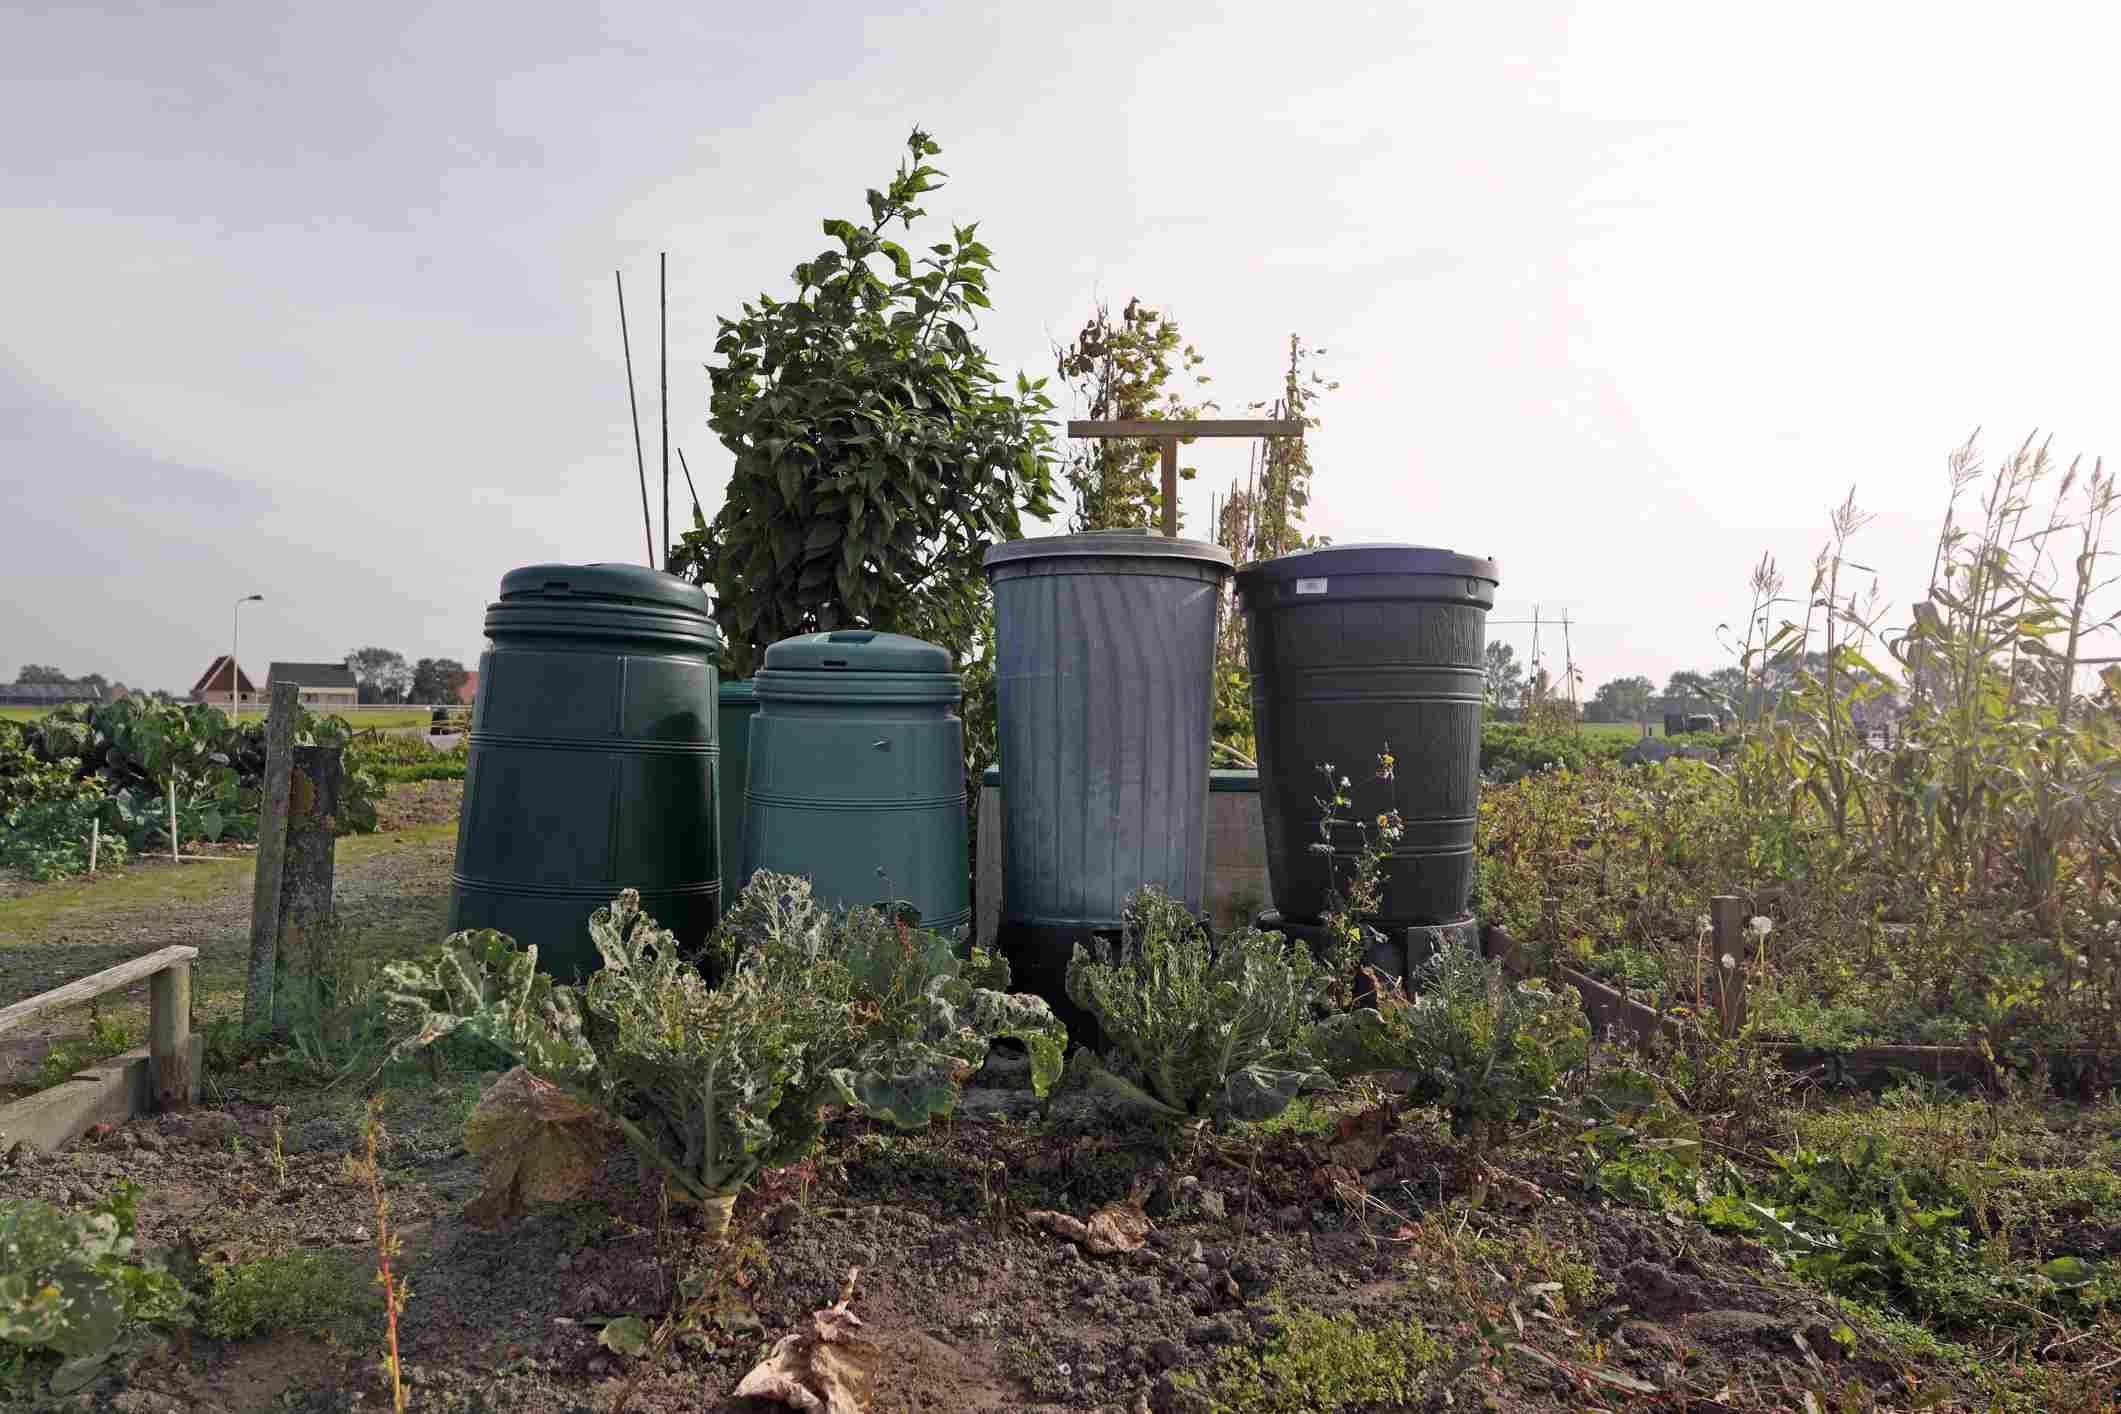 Compost bins in a vegetable garden